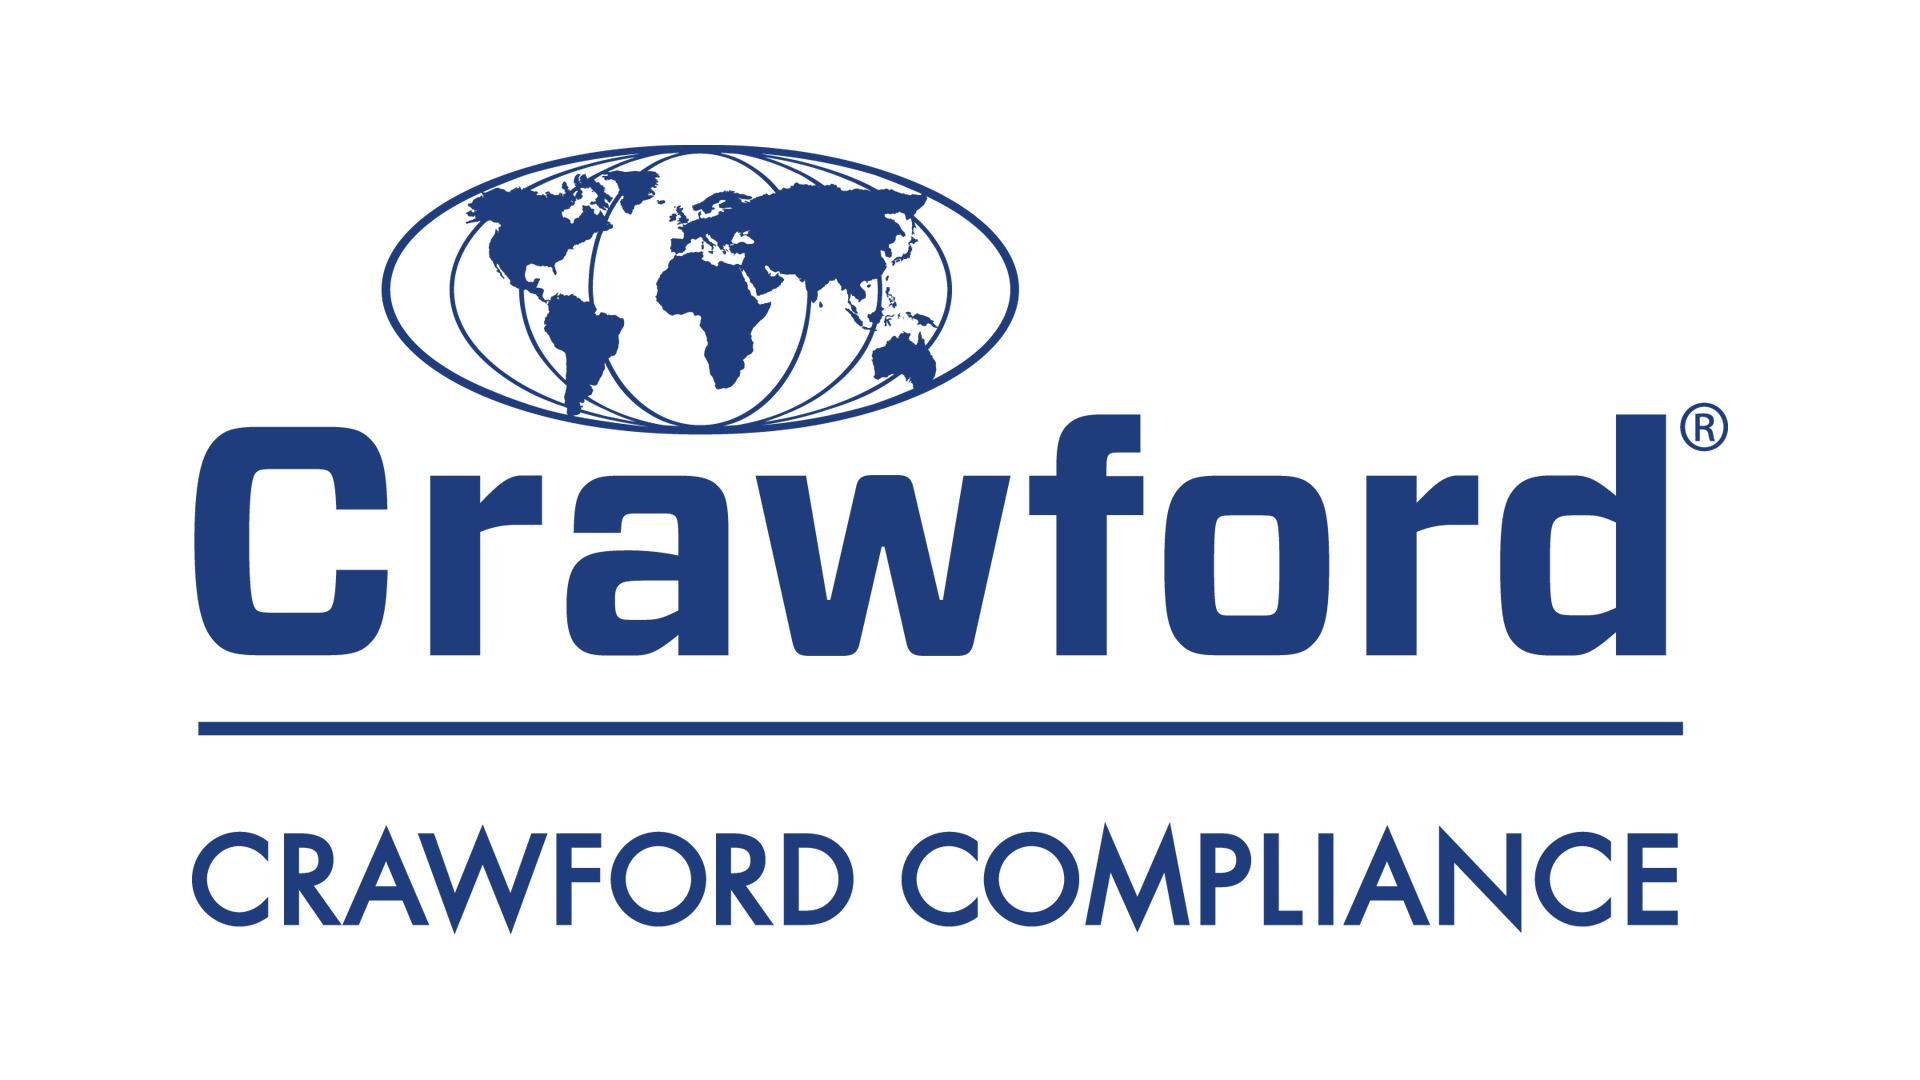 crawford compliance